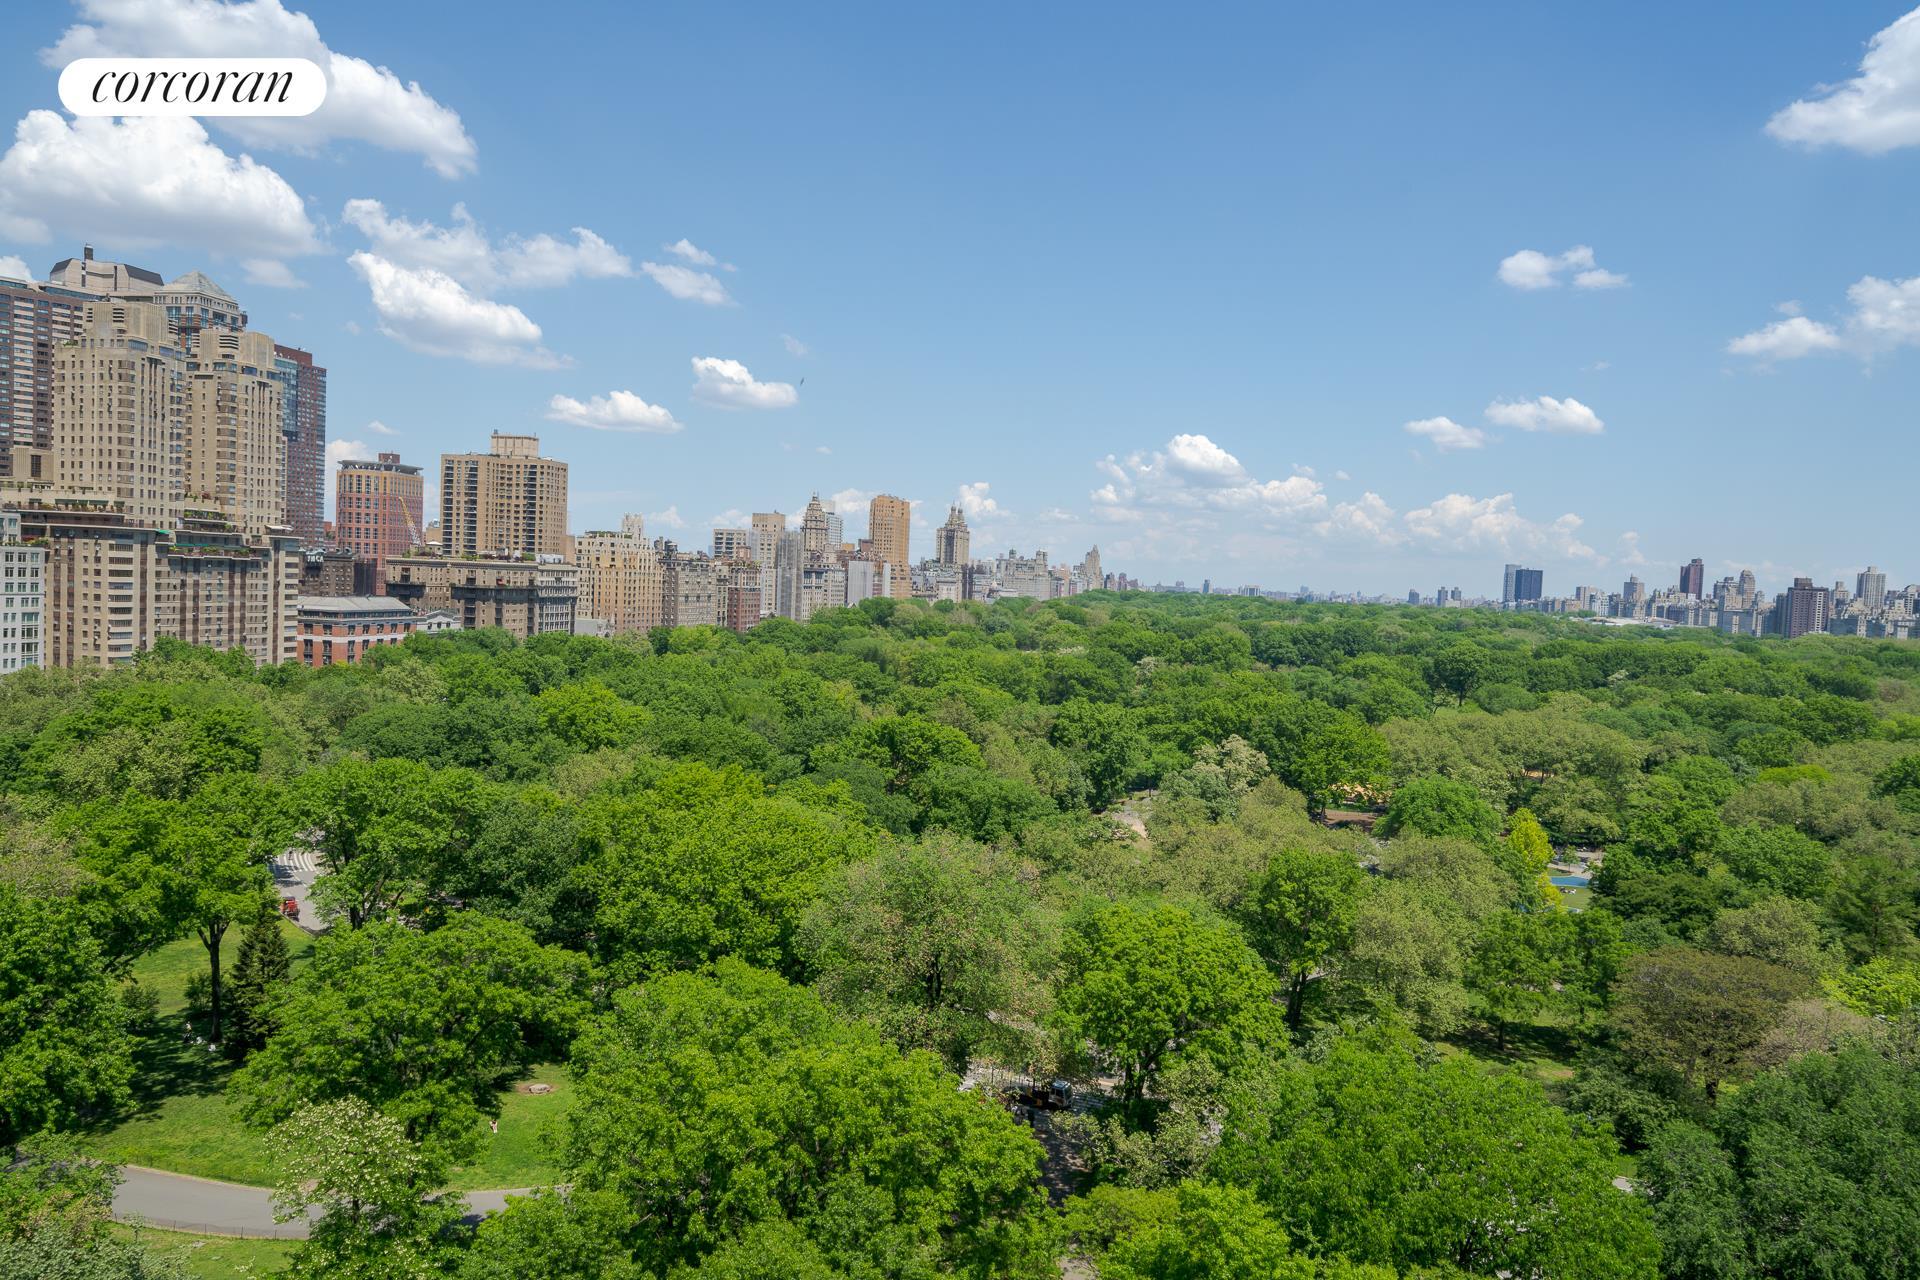 200 Central Park South Central Park South New York NY 10019